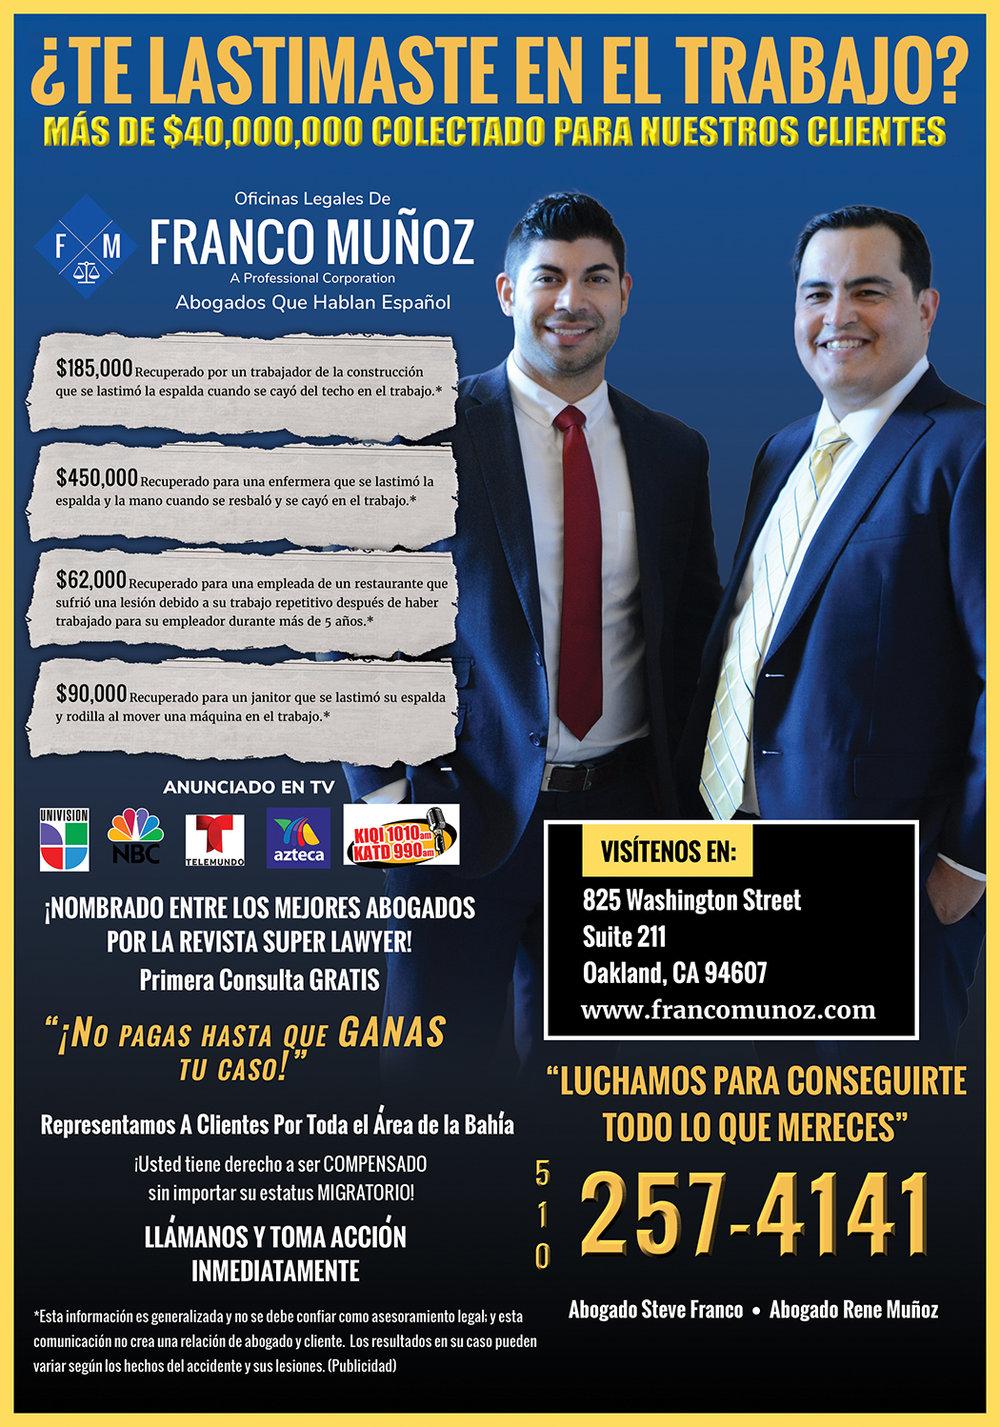 Franco Munoz - Law Office 1 Pag GLOSSY - feb 2018 copy.jpg